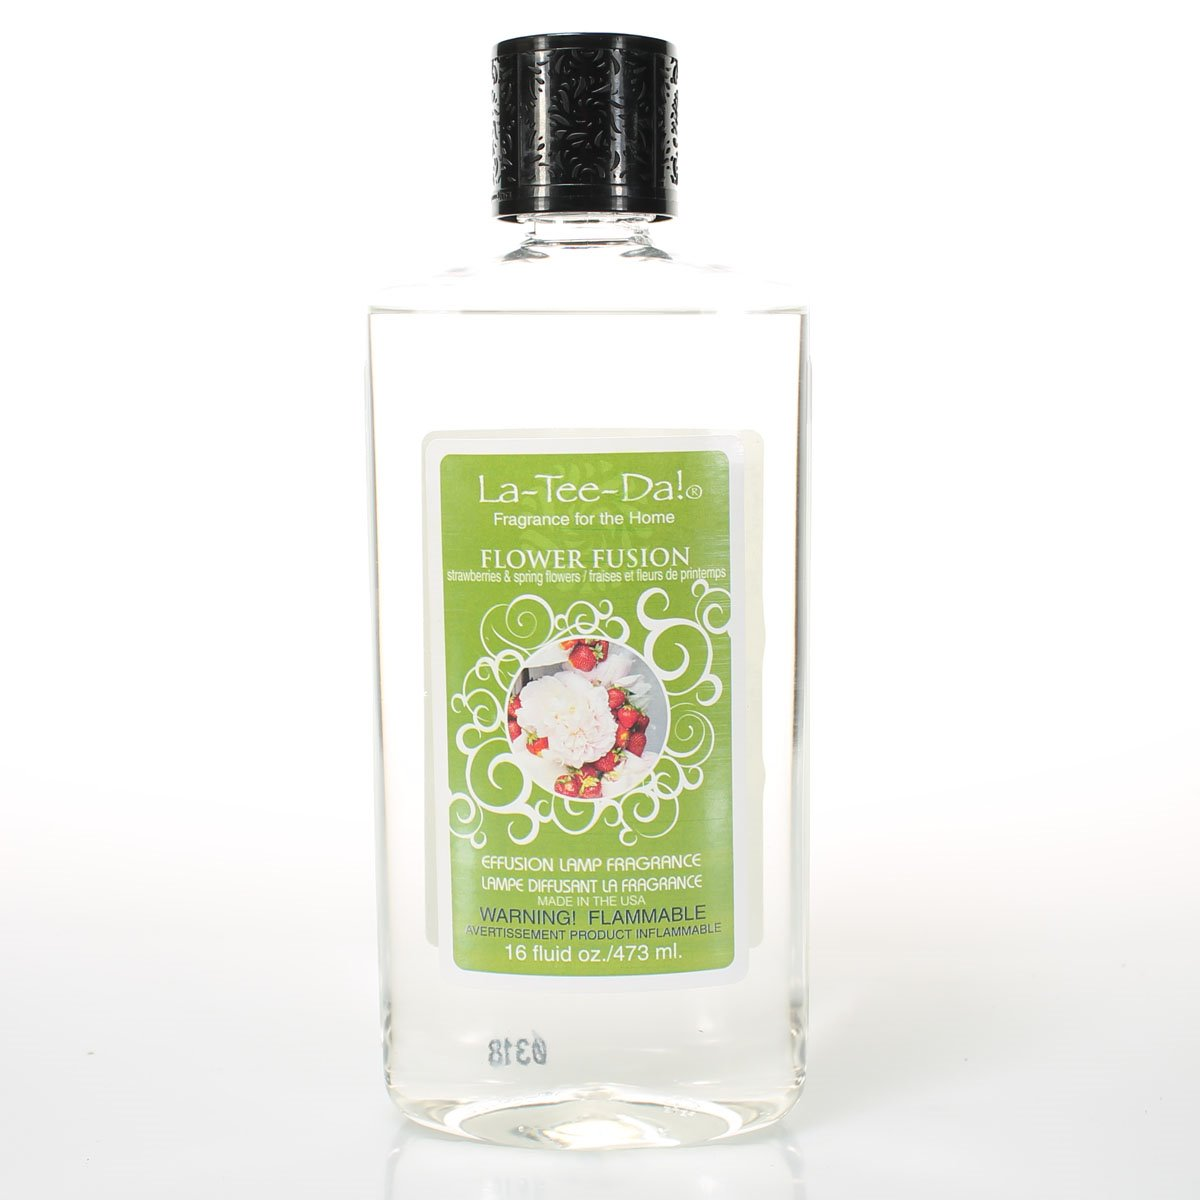 La Tee Da Fuel Fragrance Flower Fusion (16 oz.)